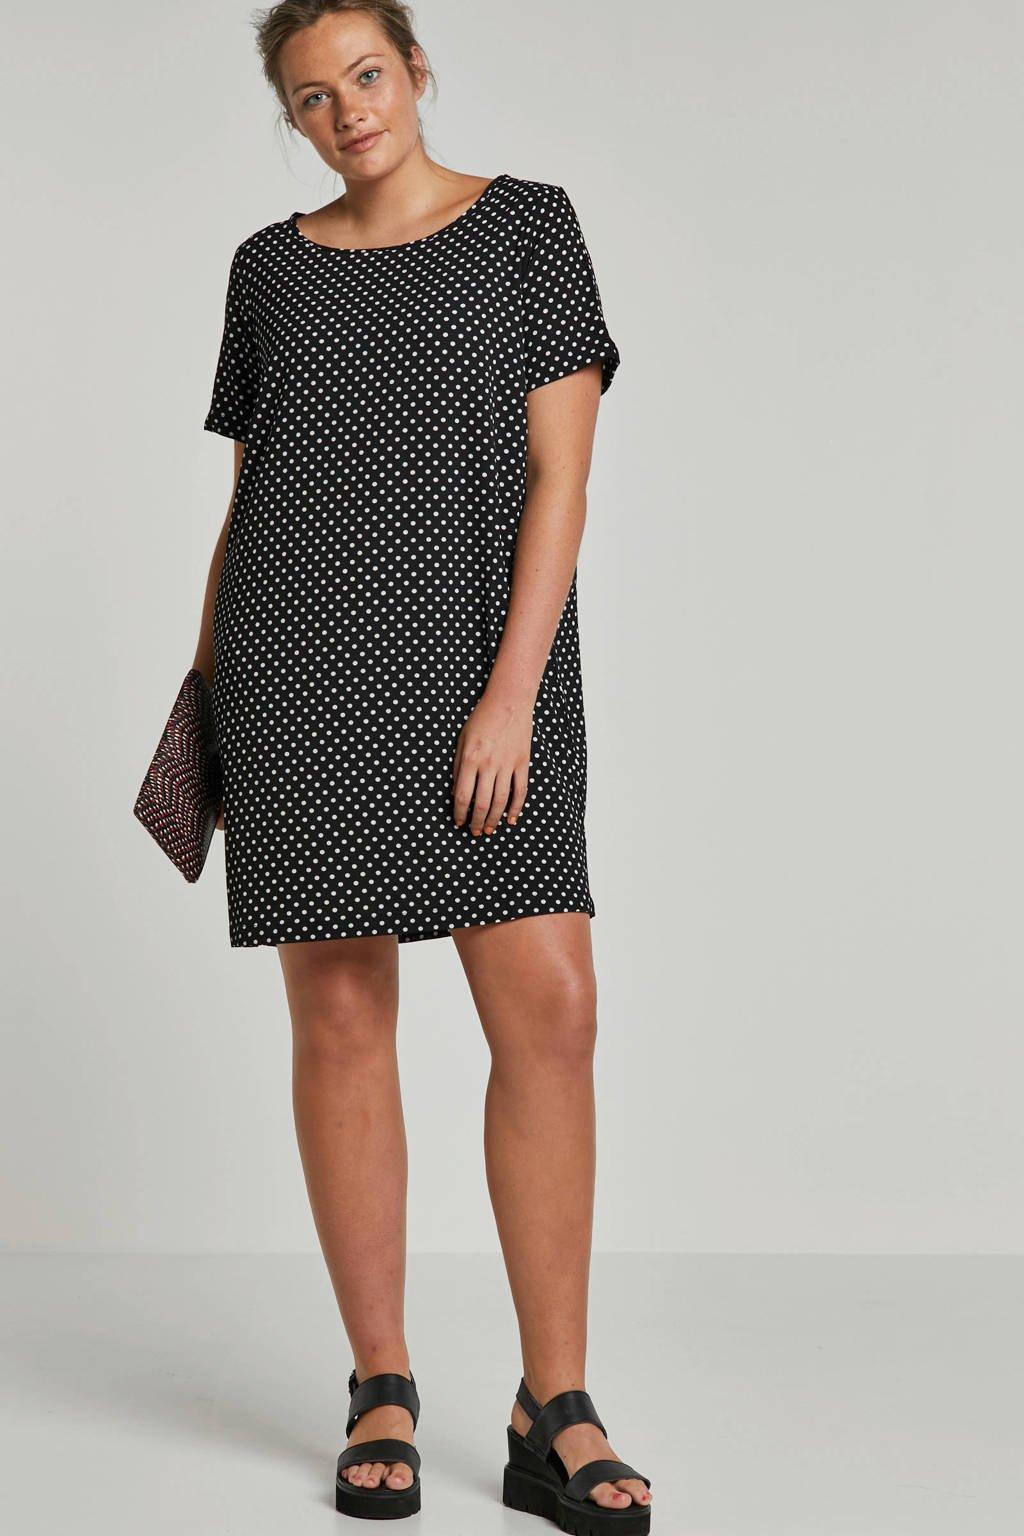 ONLY carmakoma jurk met stippen, zwart/ wit